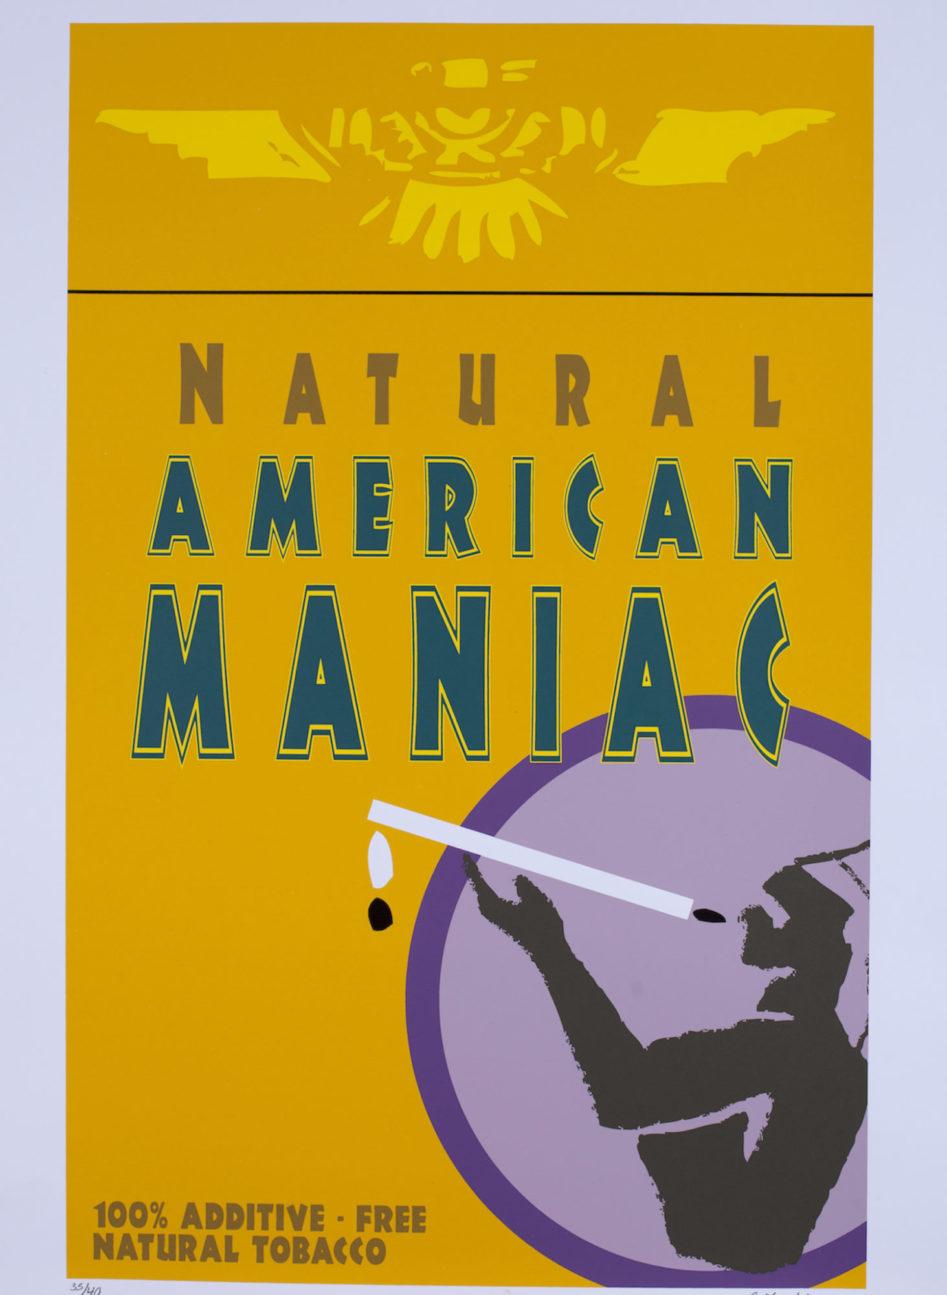 Bad Habits American Maniac by Kristin Simmons